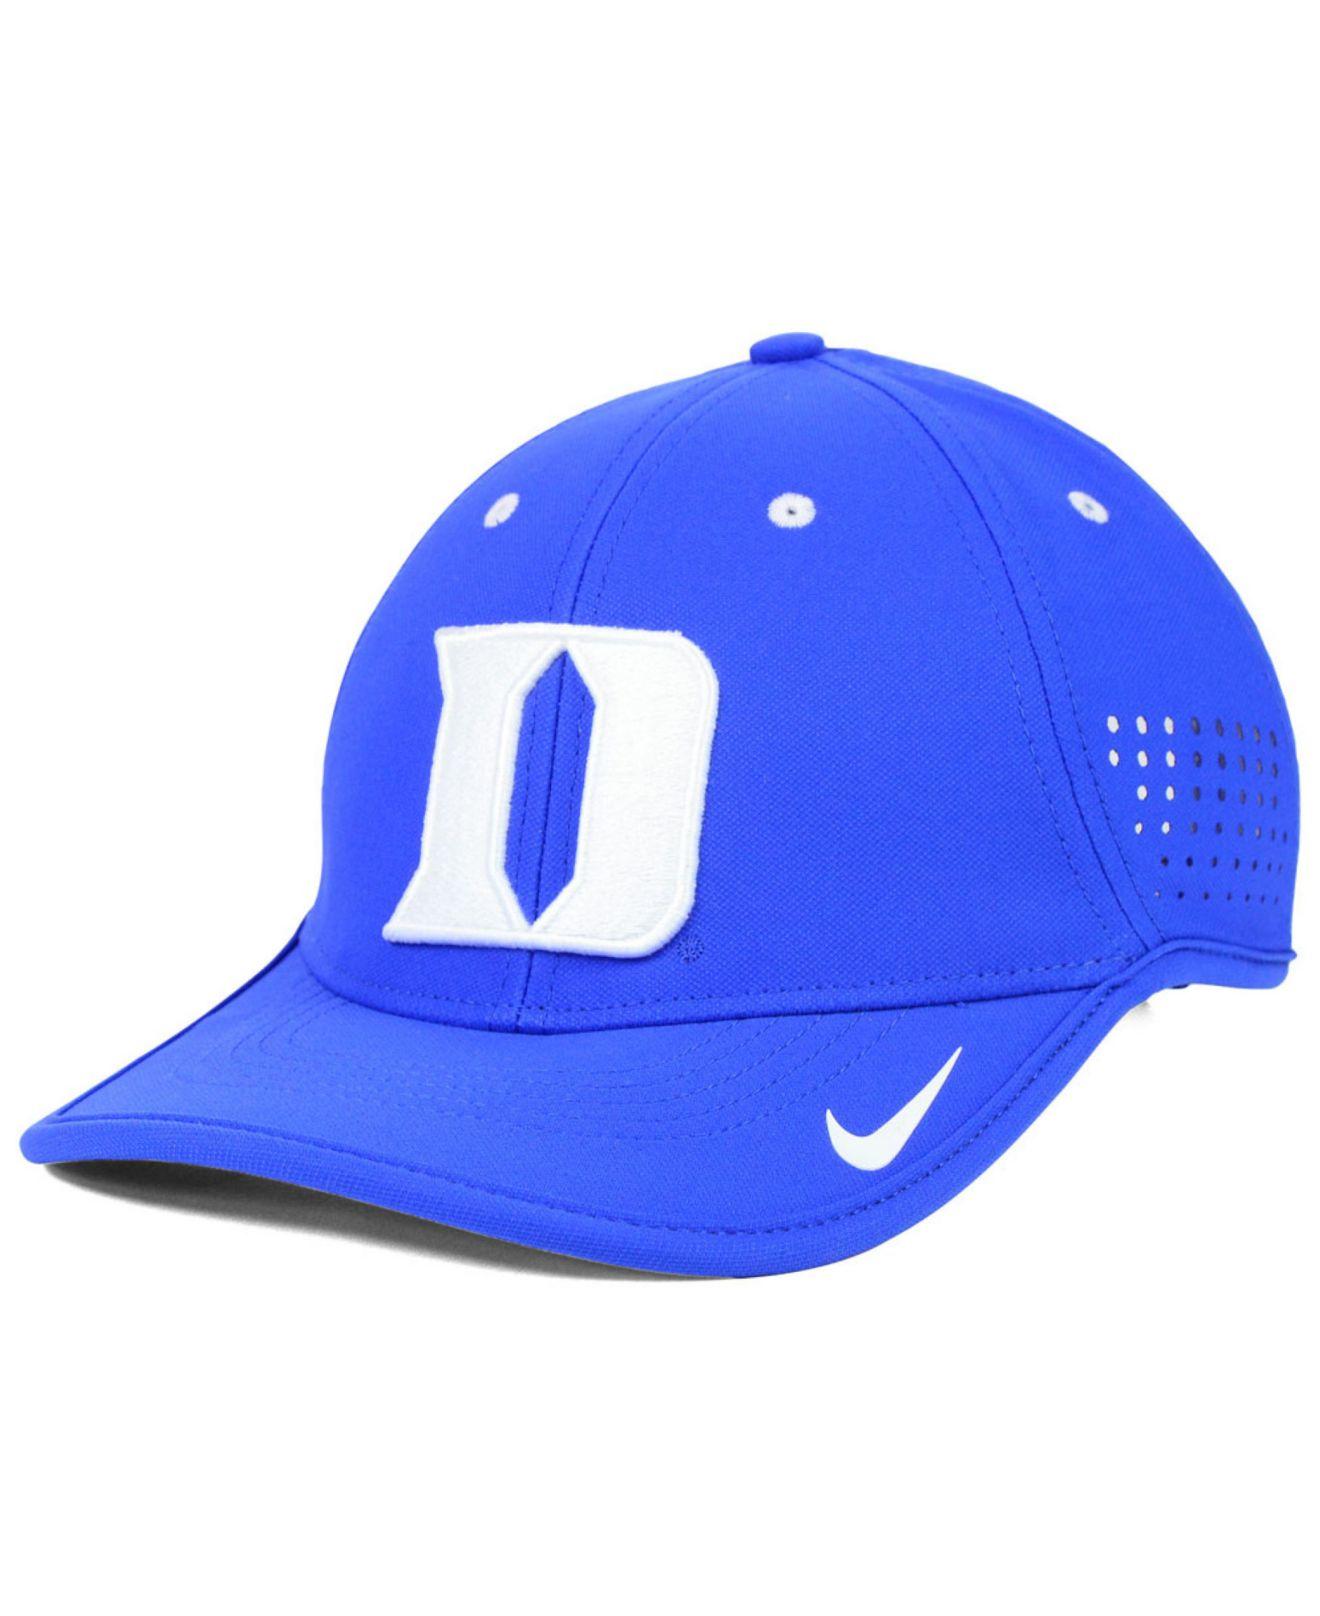 5773ea362 ... good duke fitted hats new era e2858 6bfcd